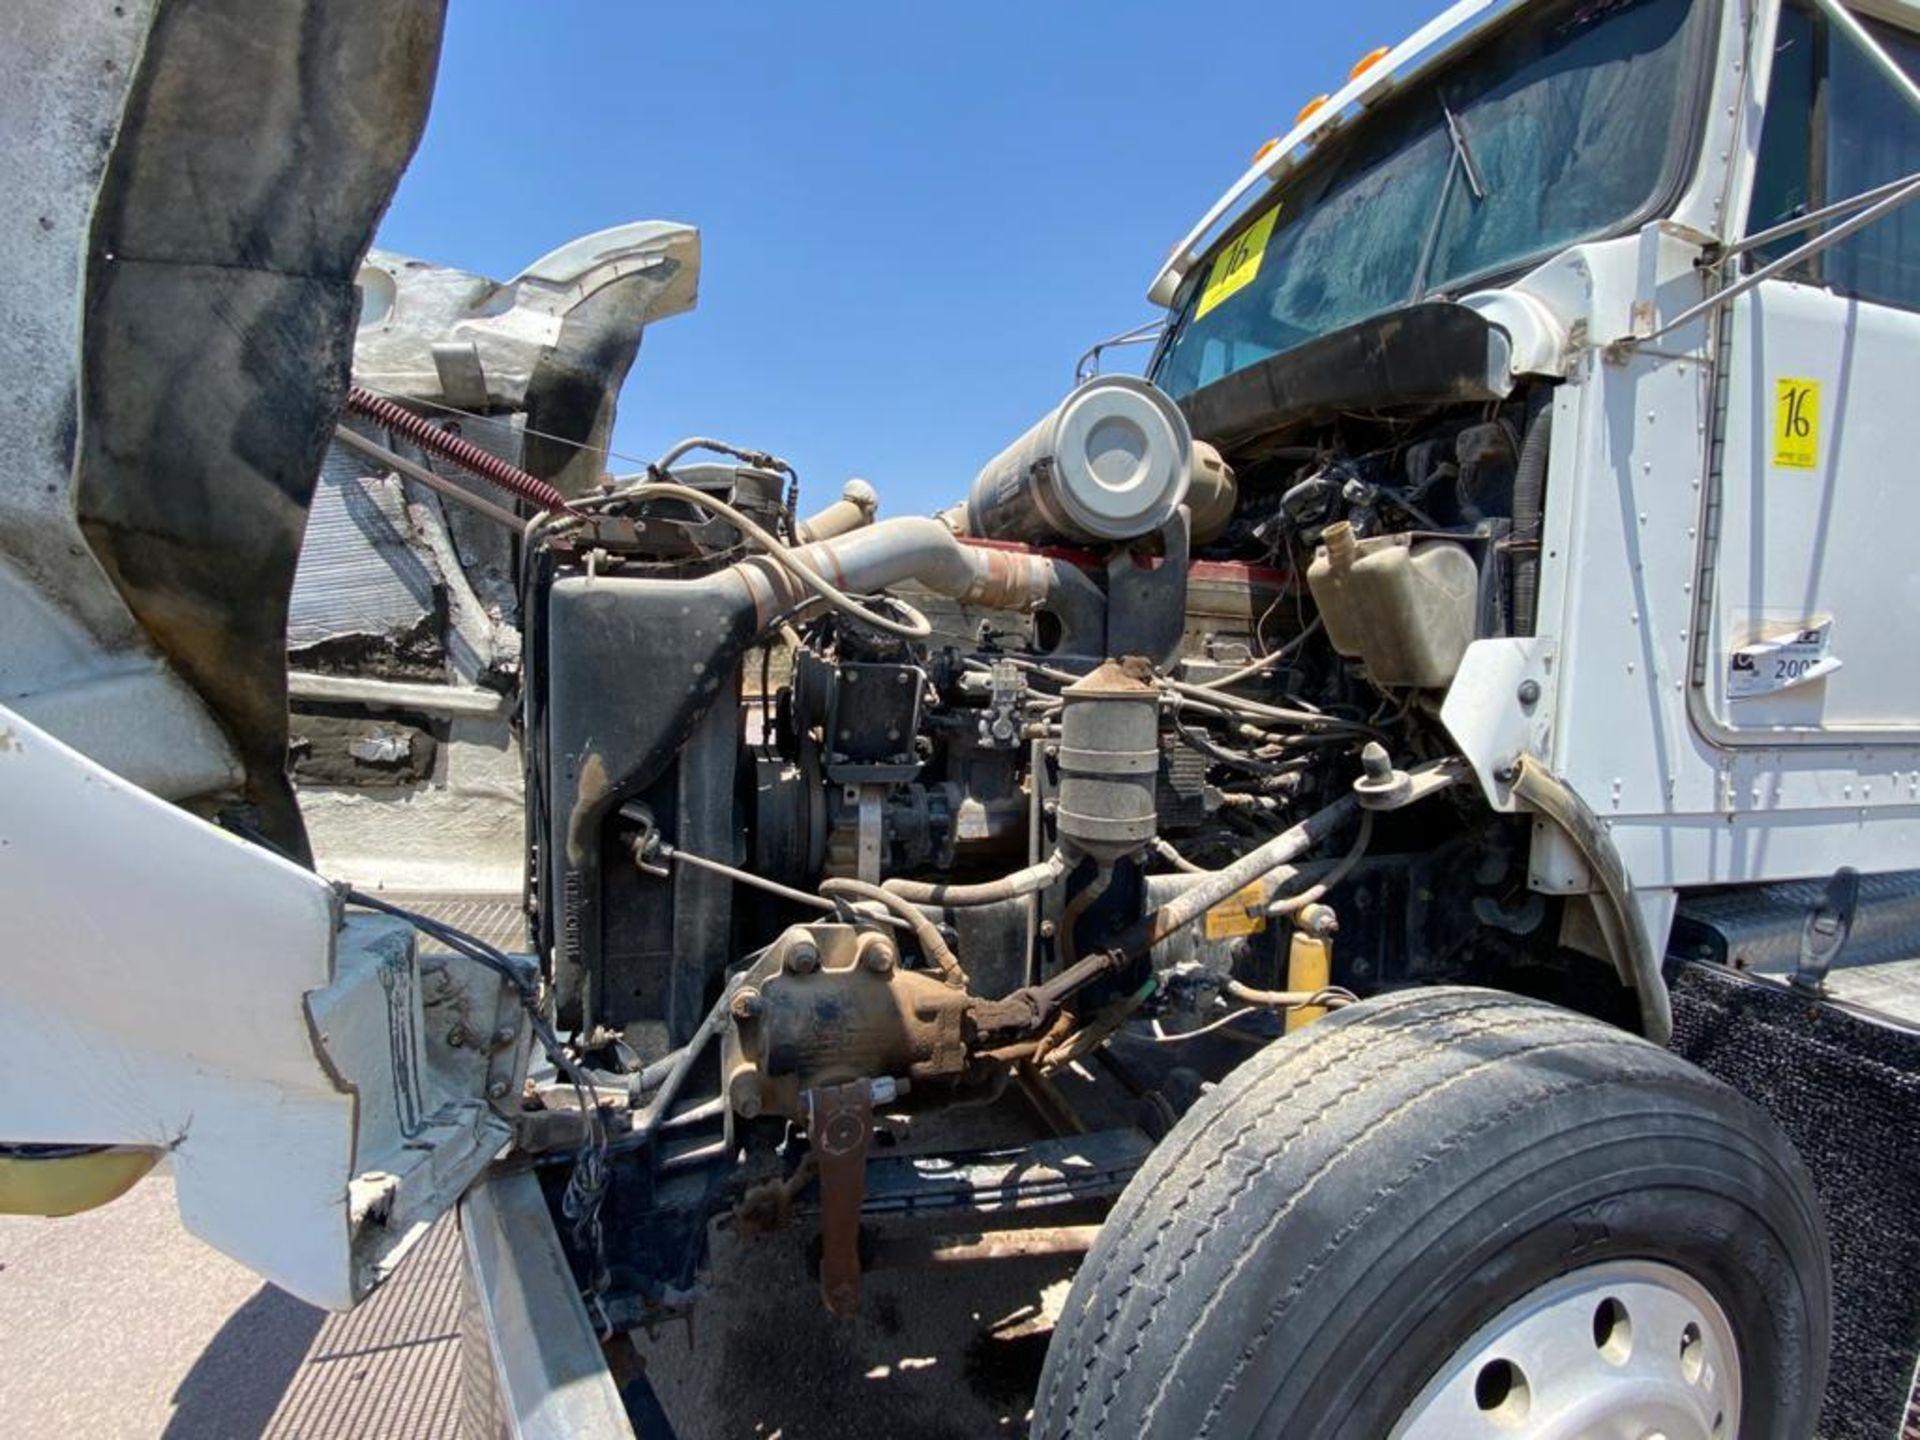 1998 Kenworth 5000 Gallon, standard transmission of 16 speeds - Image 51 of 68